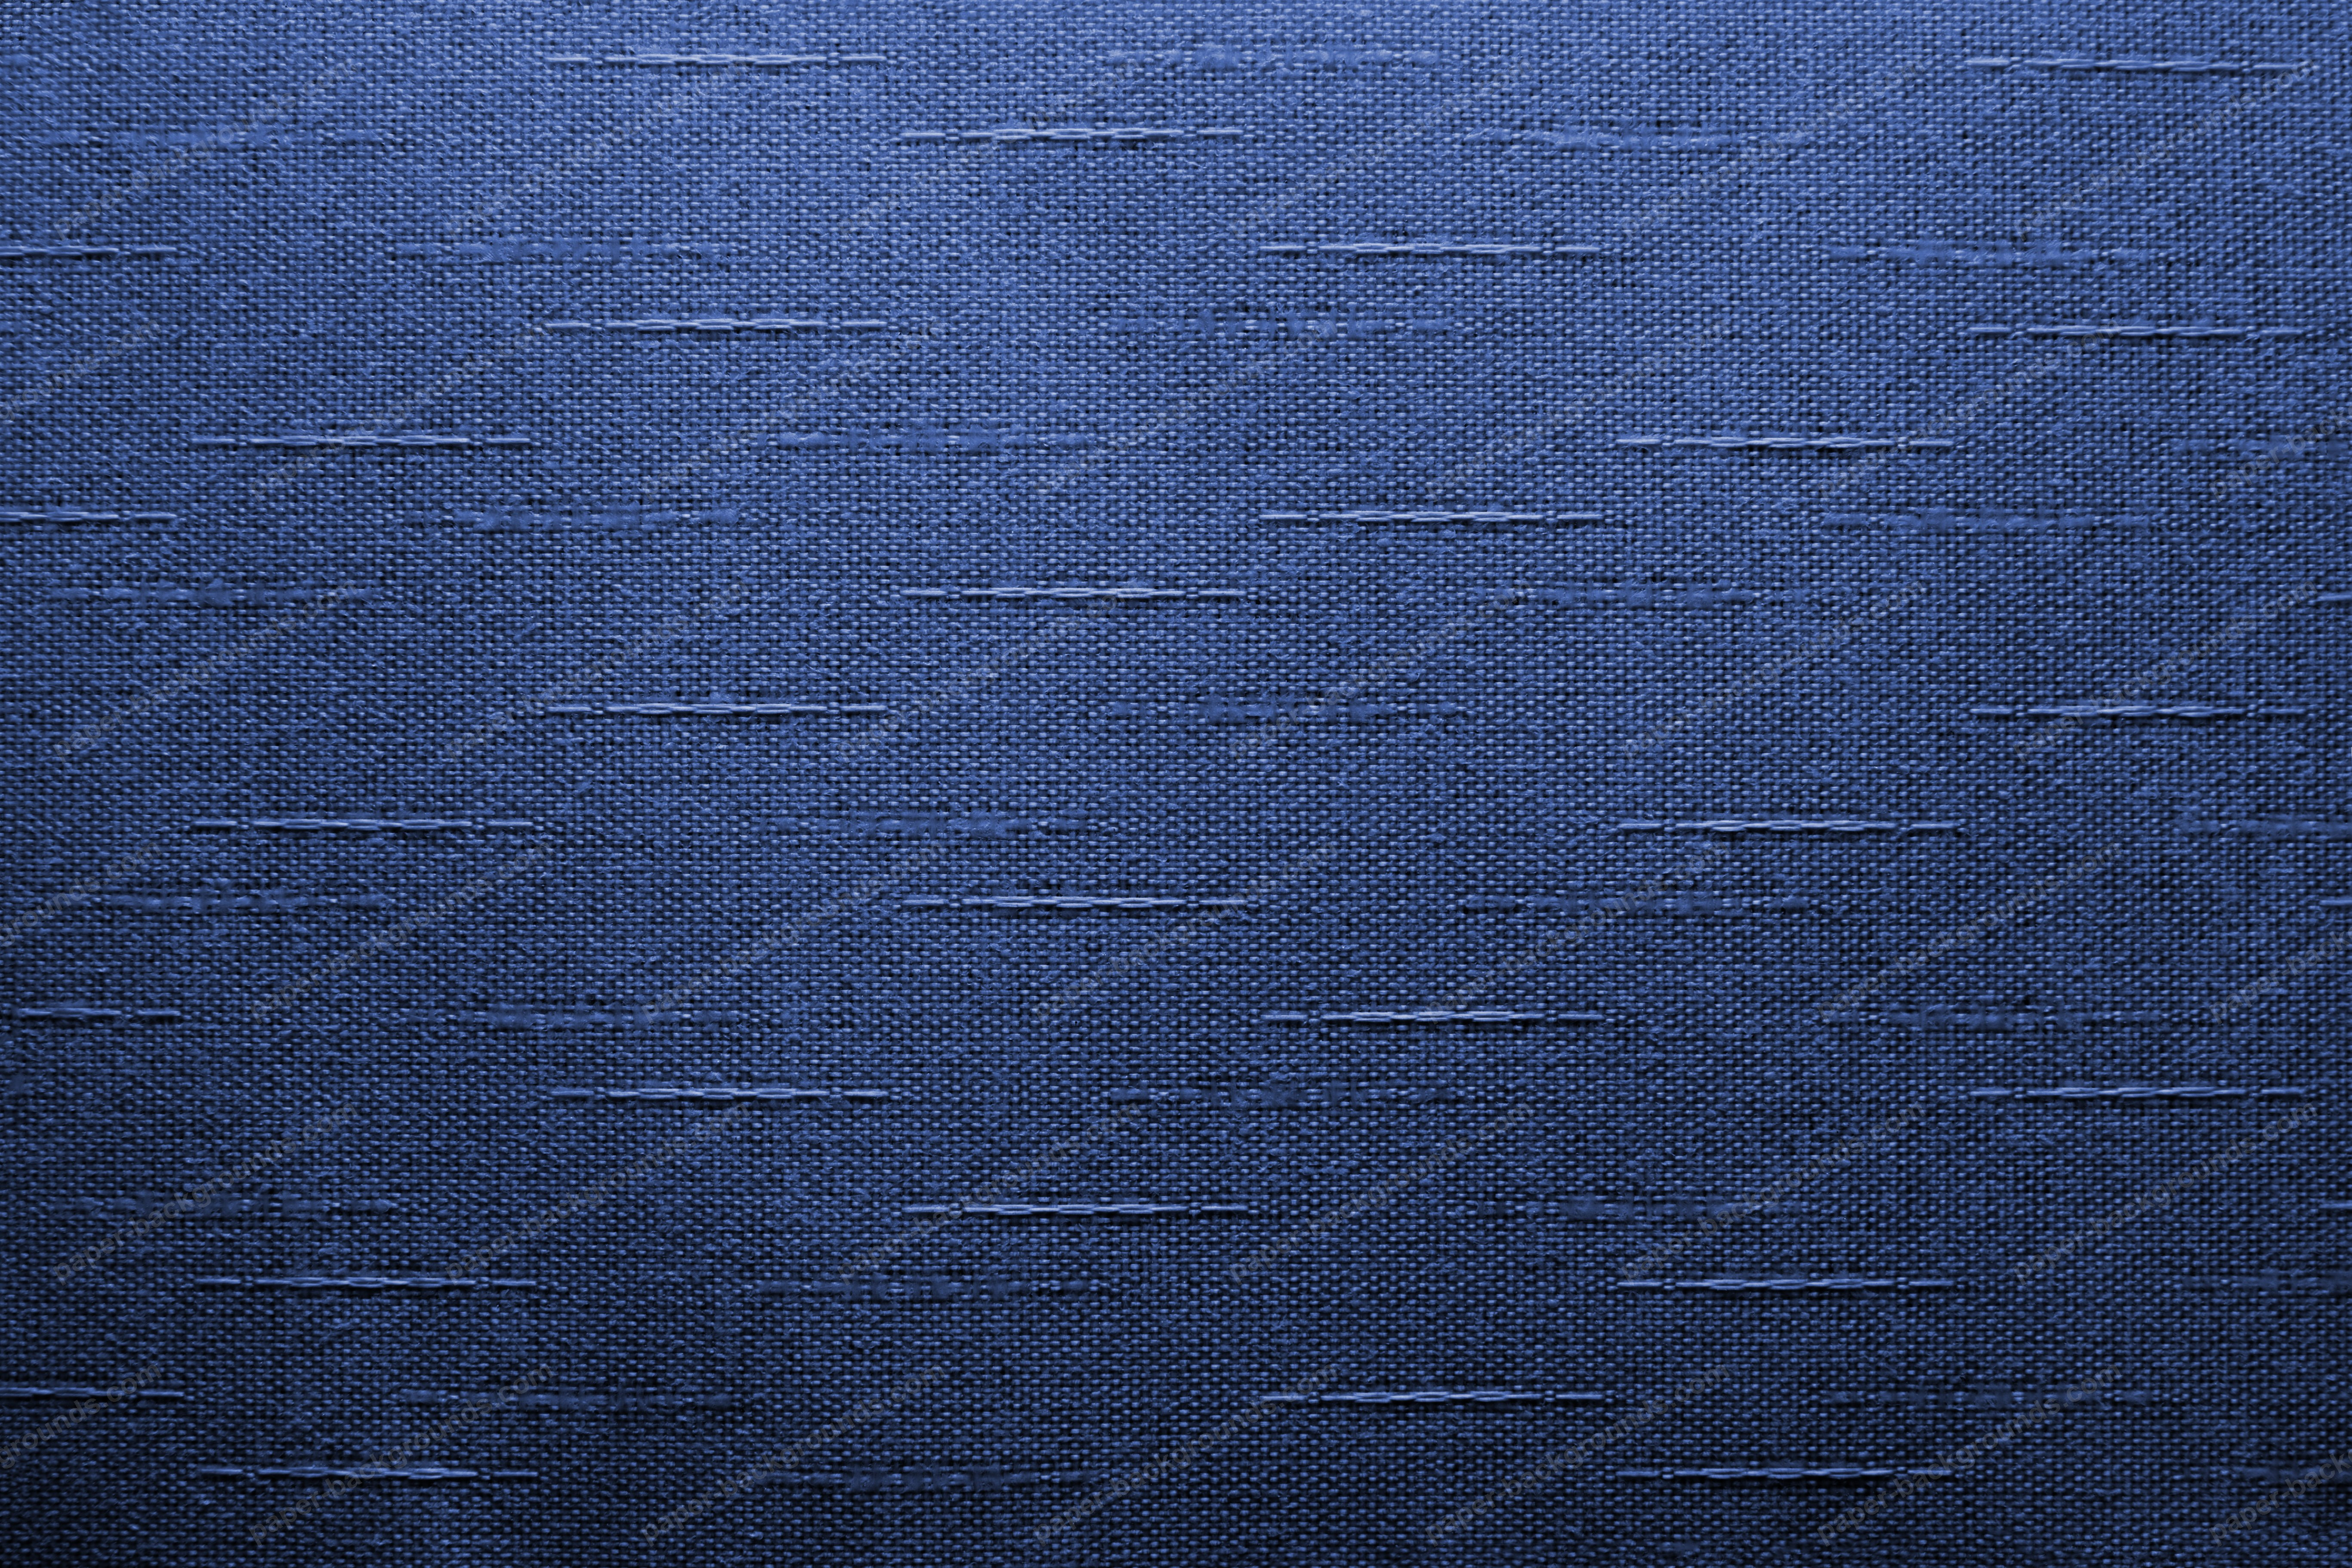 Blue Canvas Texture Background Paper Backgrounds 5466x3645